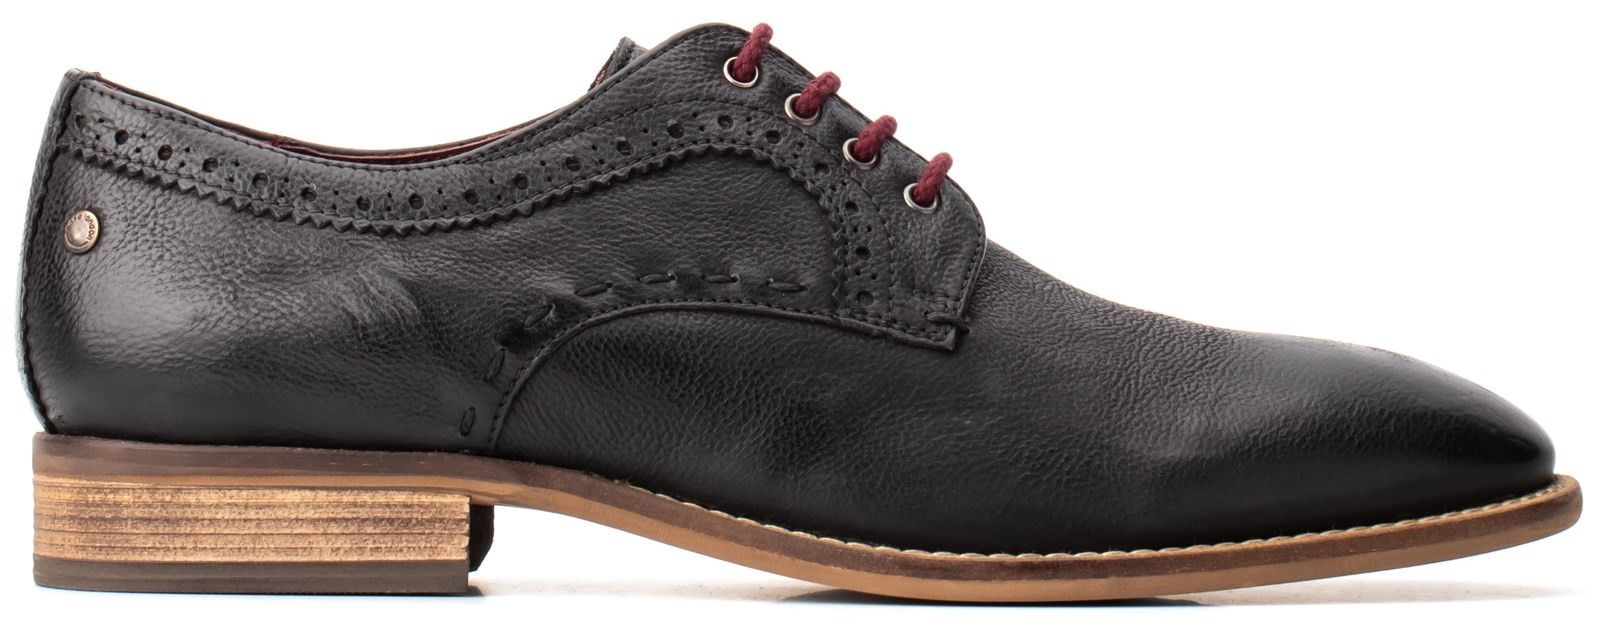 Haddon Softy Lace Up Shoe